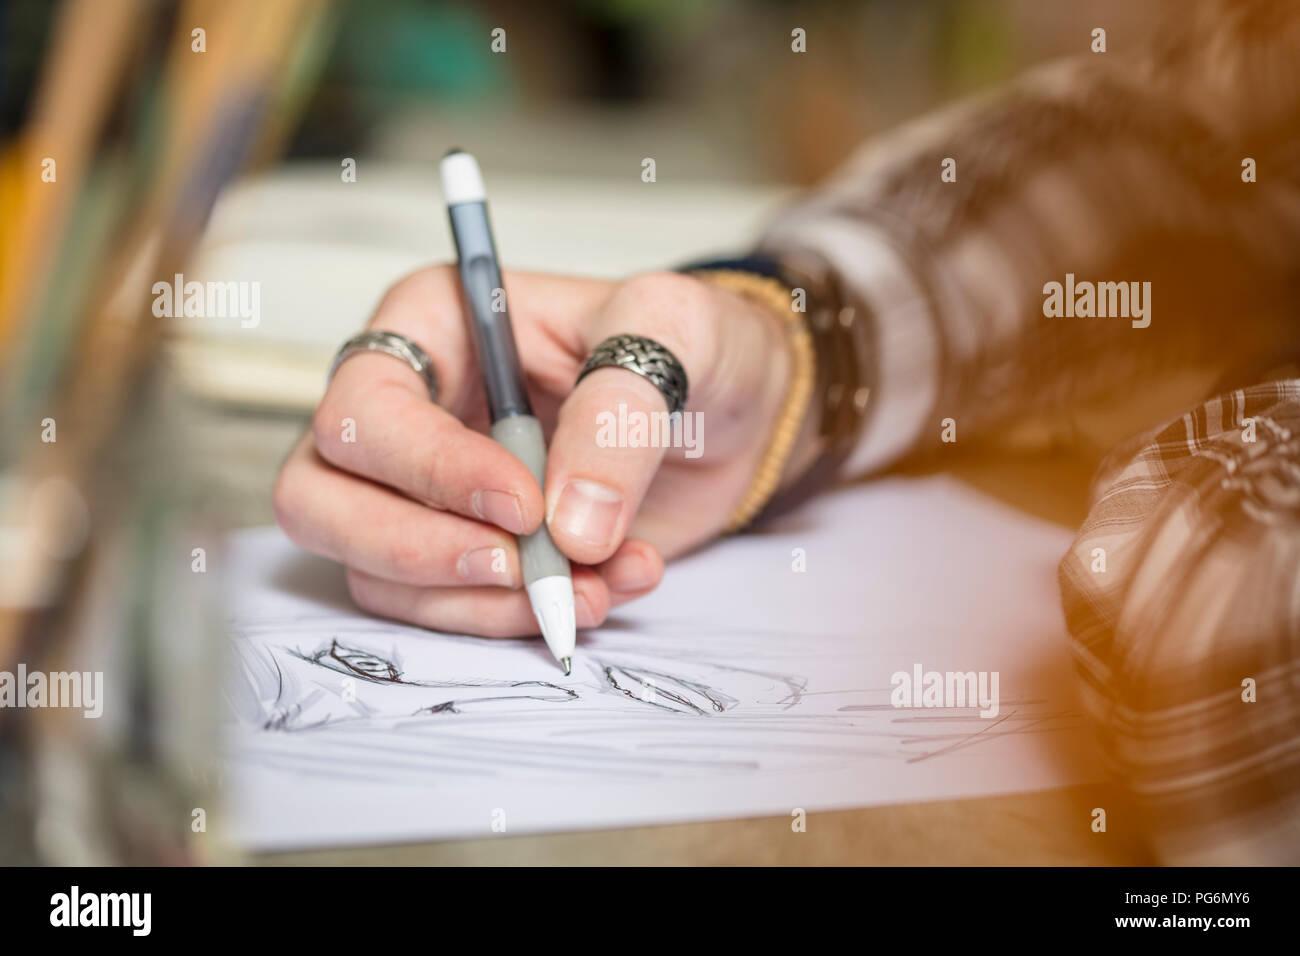 Close-up de artista un boceto de dibujo Imagen De Stock